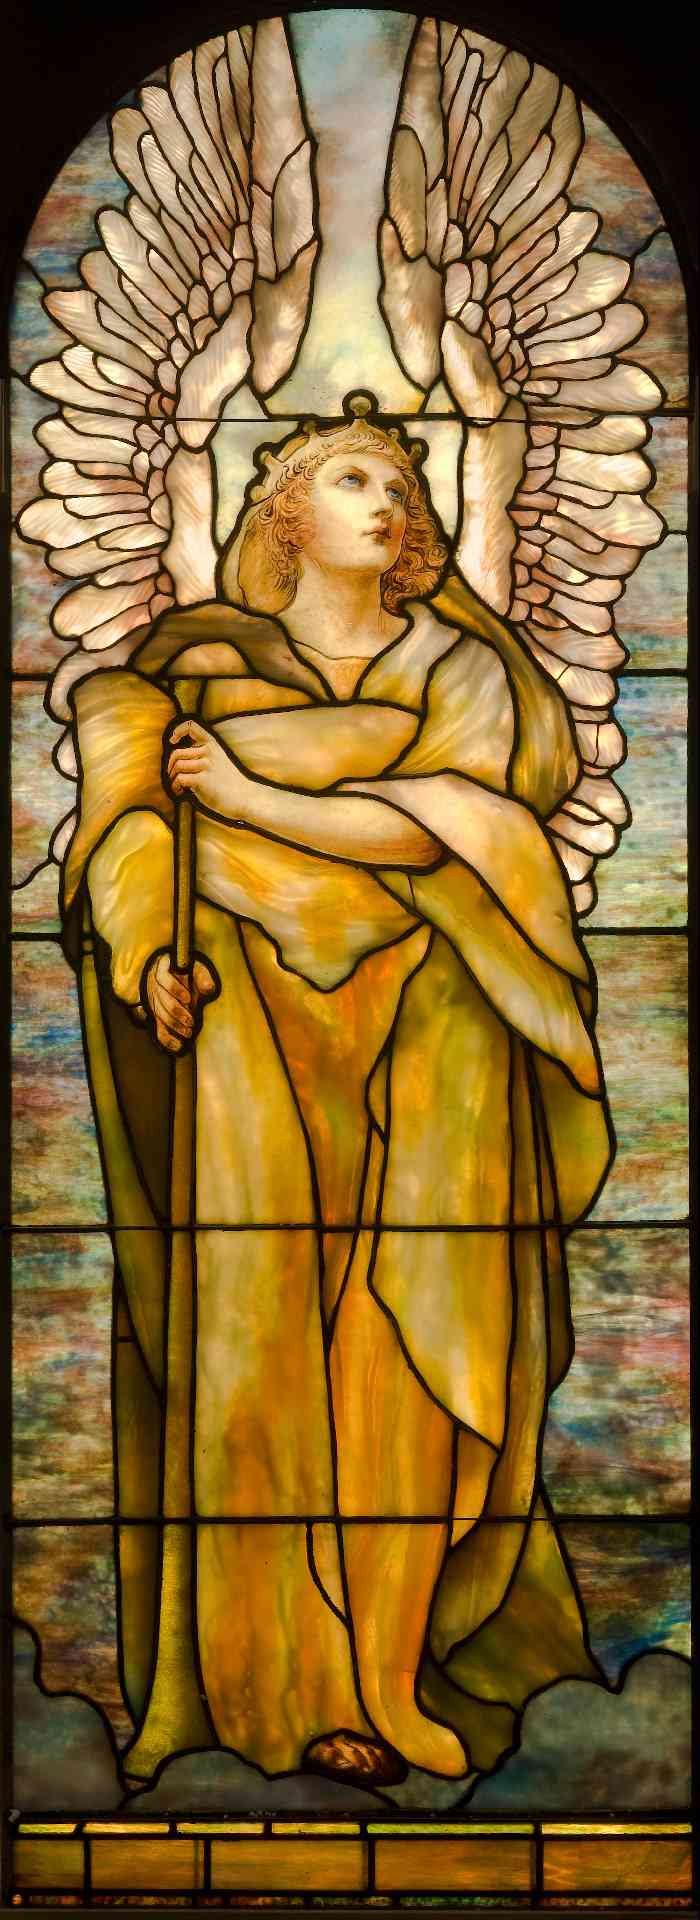 Tiffany Studios, New York, L'Ange de la Résurrection, vitrail